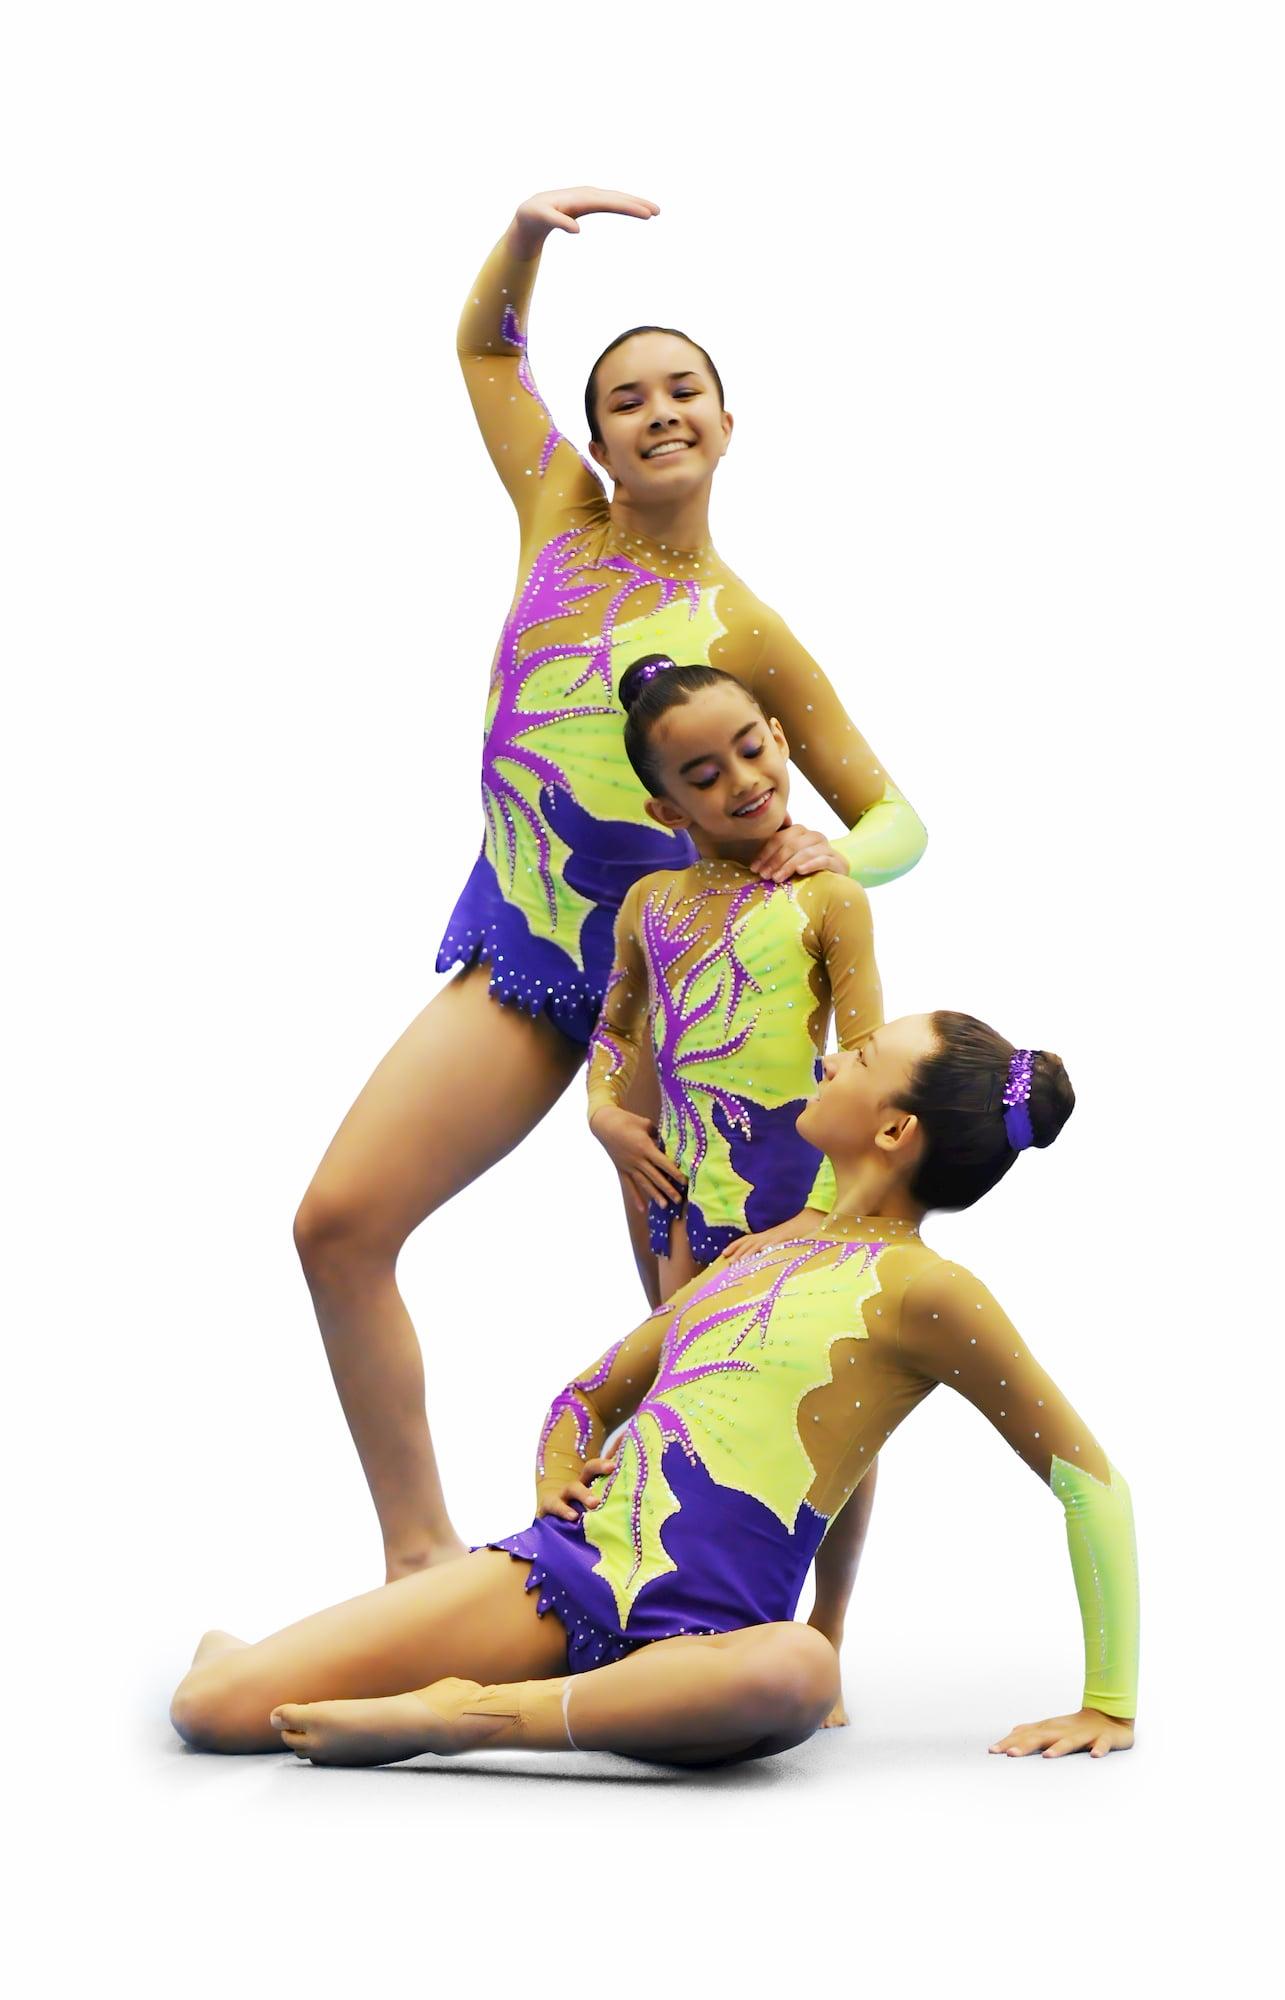 Trio at lemon, purple, ink rhythmic gymnastics leotard № 119 for competitions